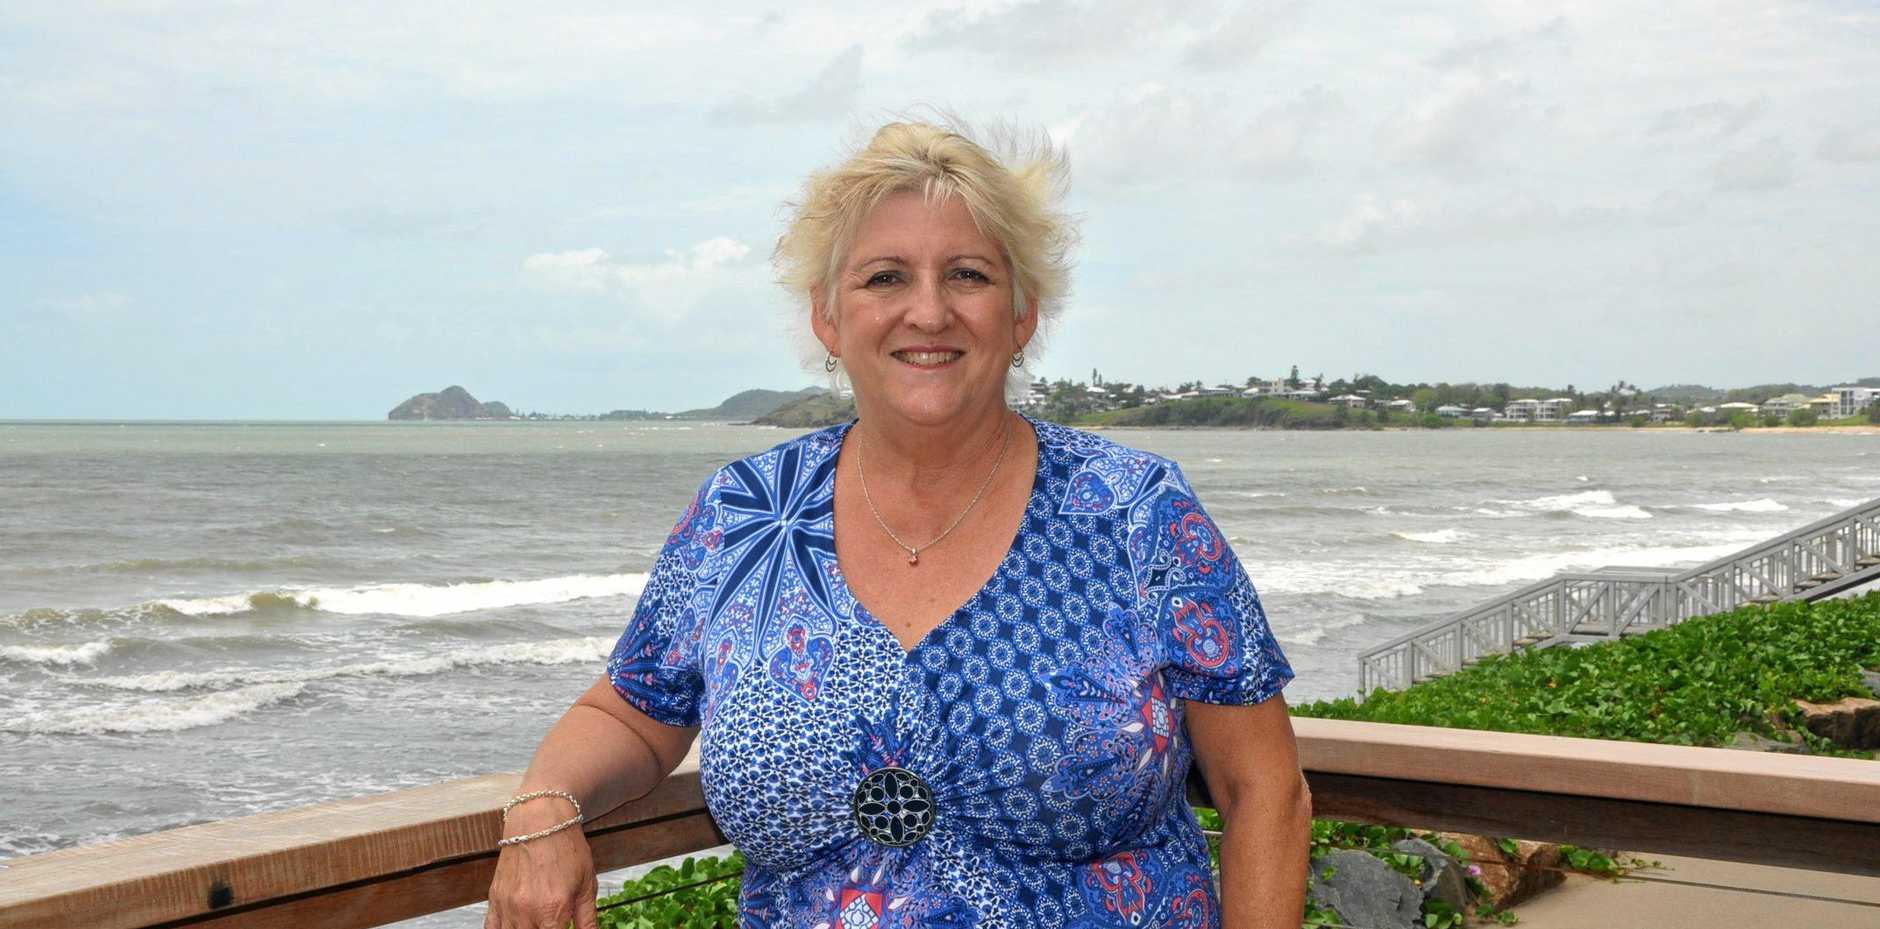 Member for Capricornia, Michelle Landry, said no compulsory land aquisitions will be undertaken